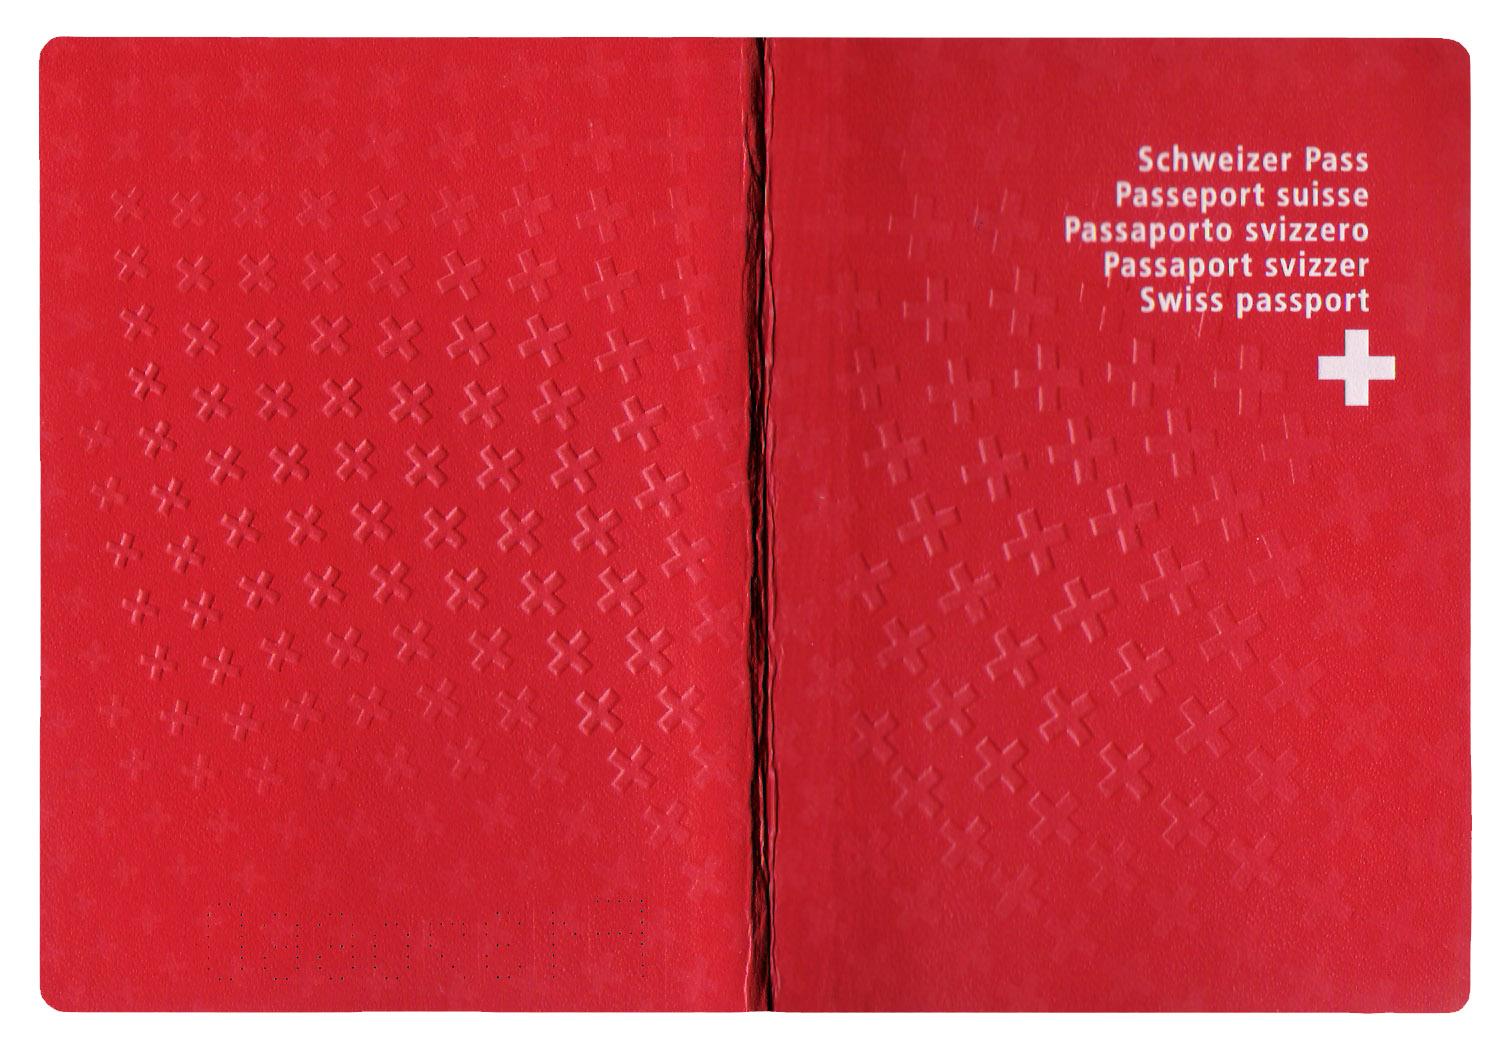 bag_passaporte_ch.jpg